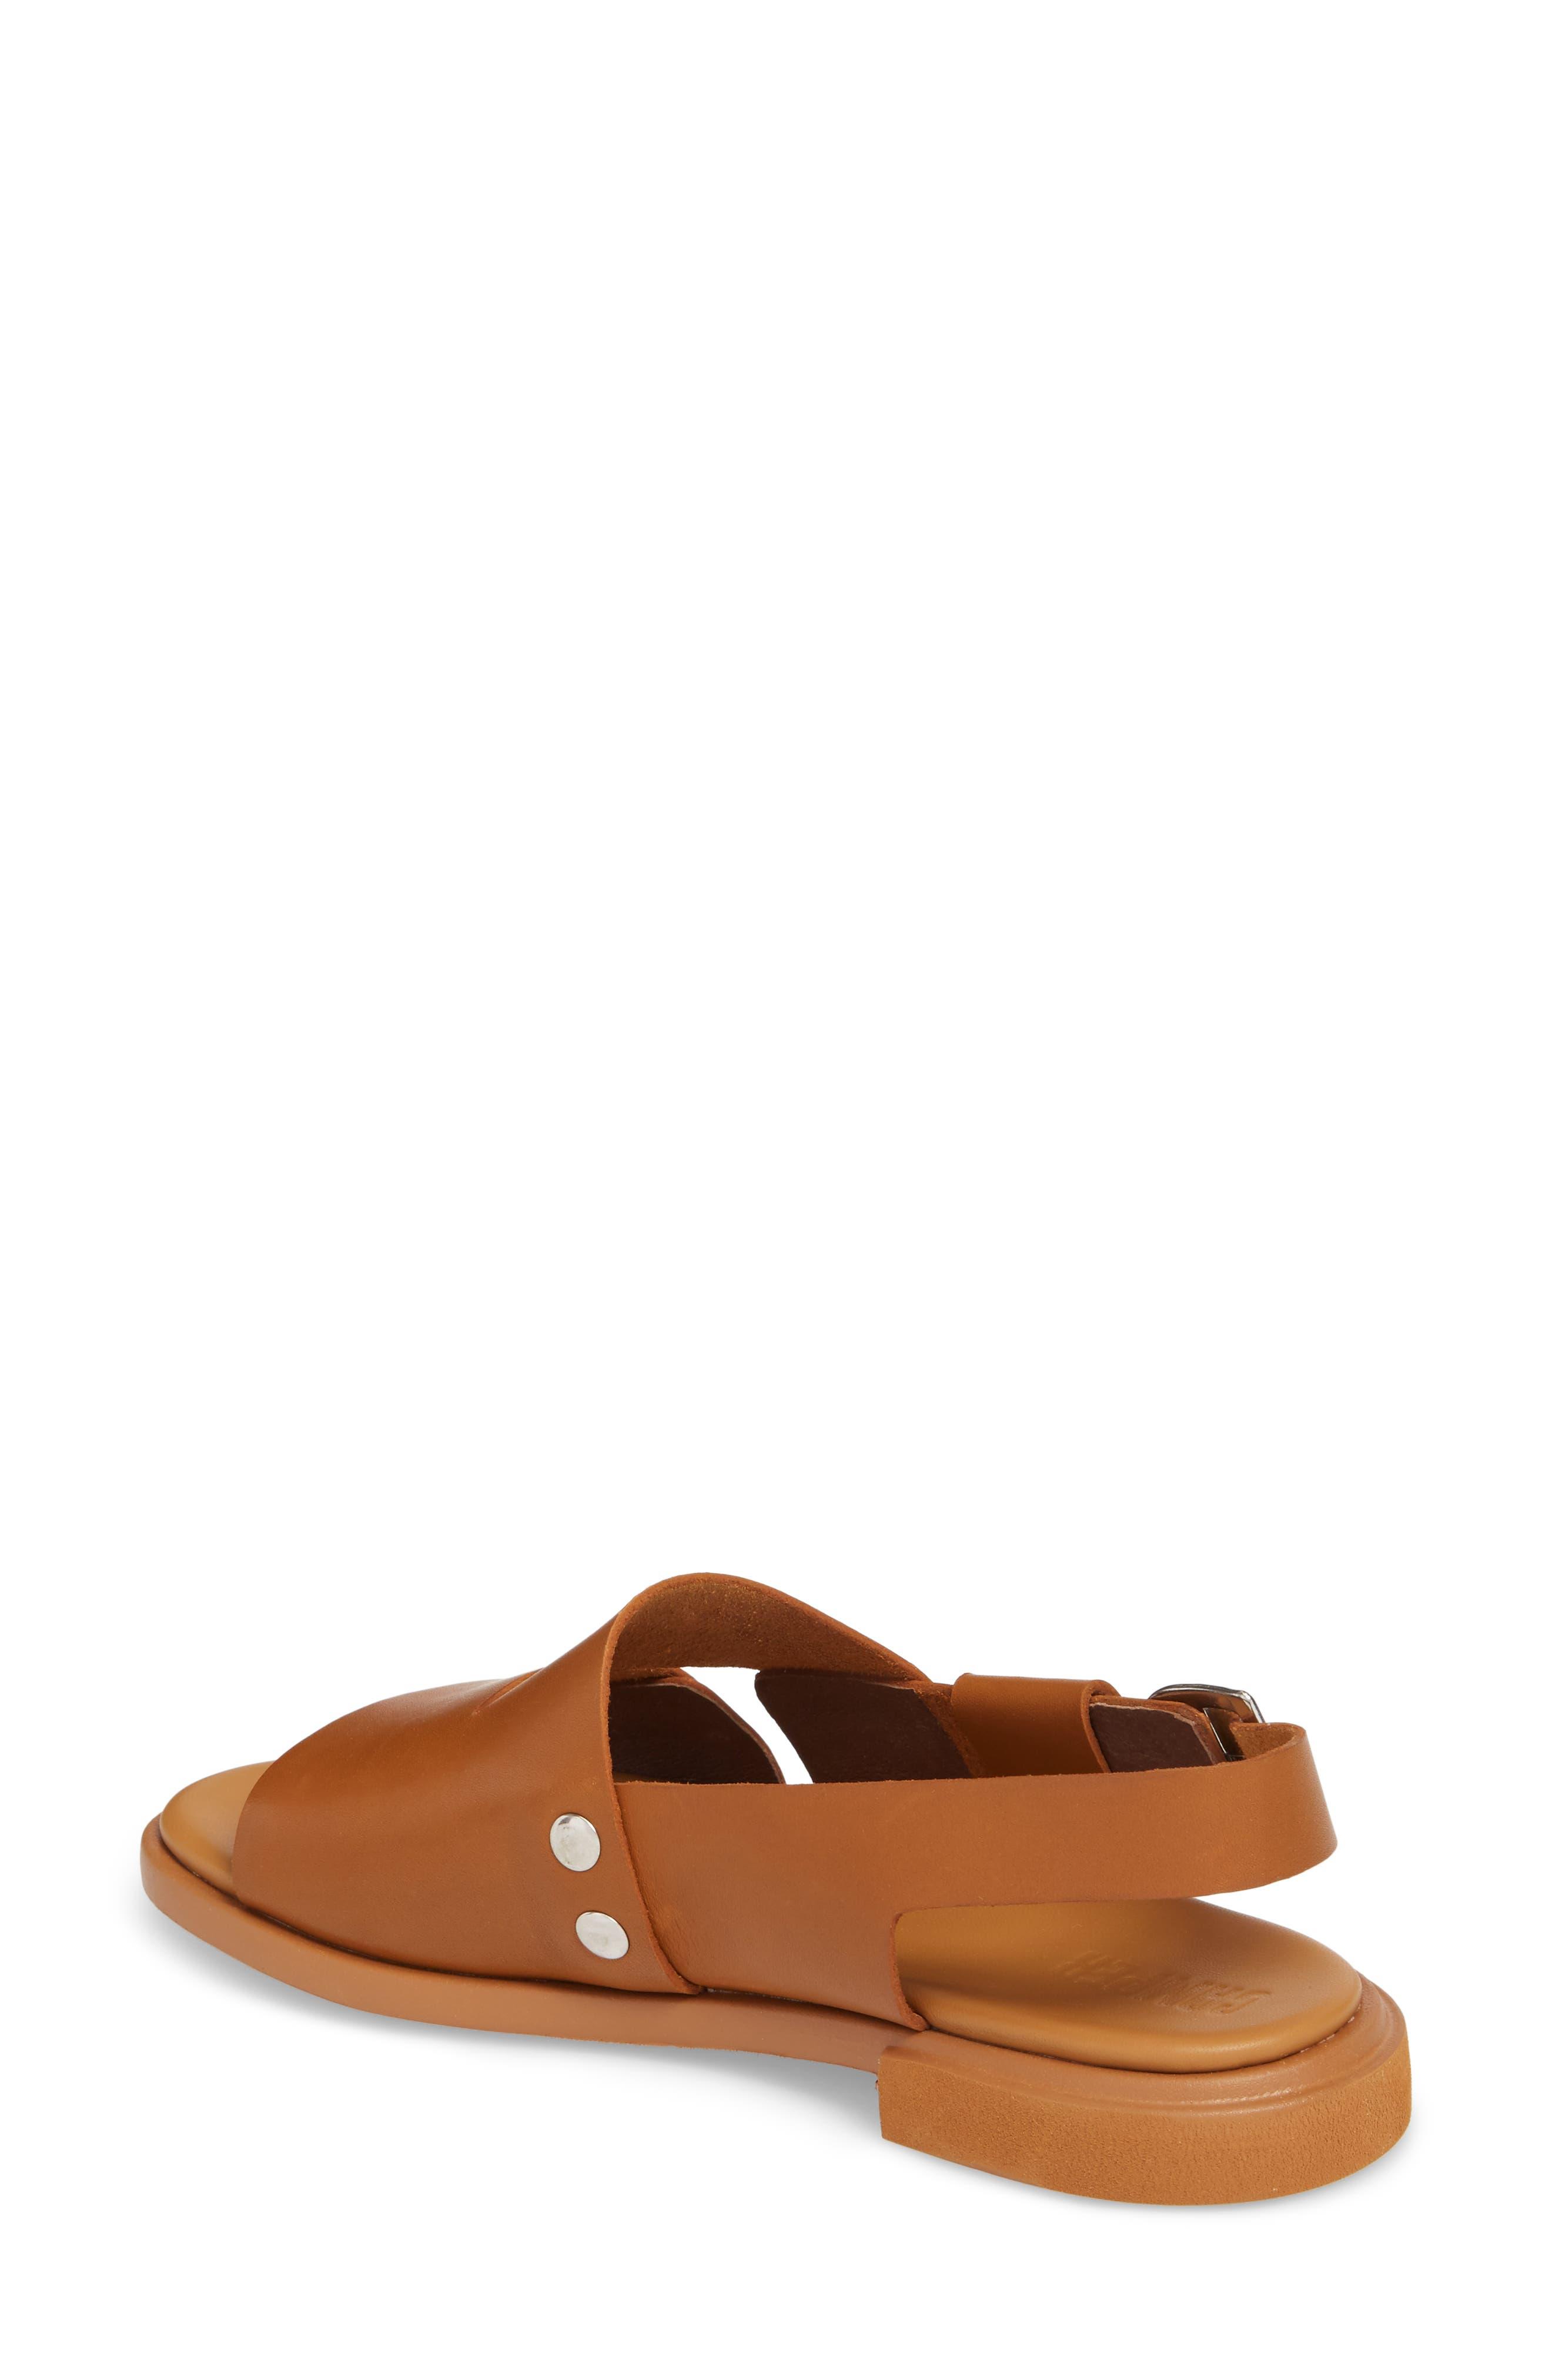 Edy Slingback Sandal,                             Alternate thumbnail 2, color,                             Rust/ Copper Leather